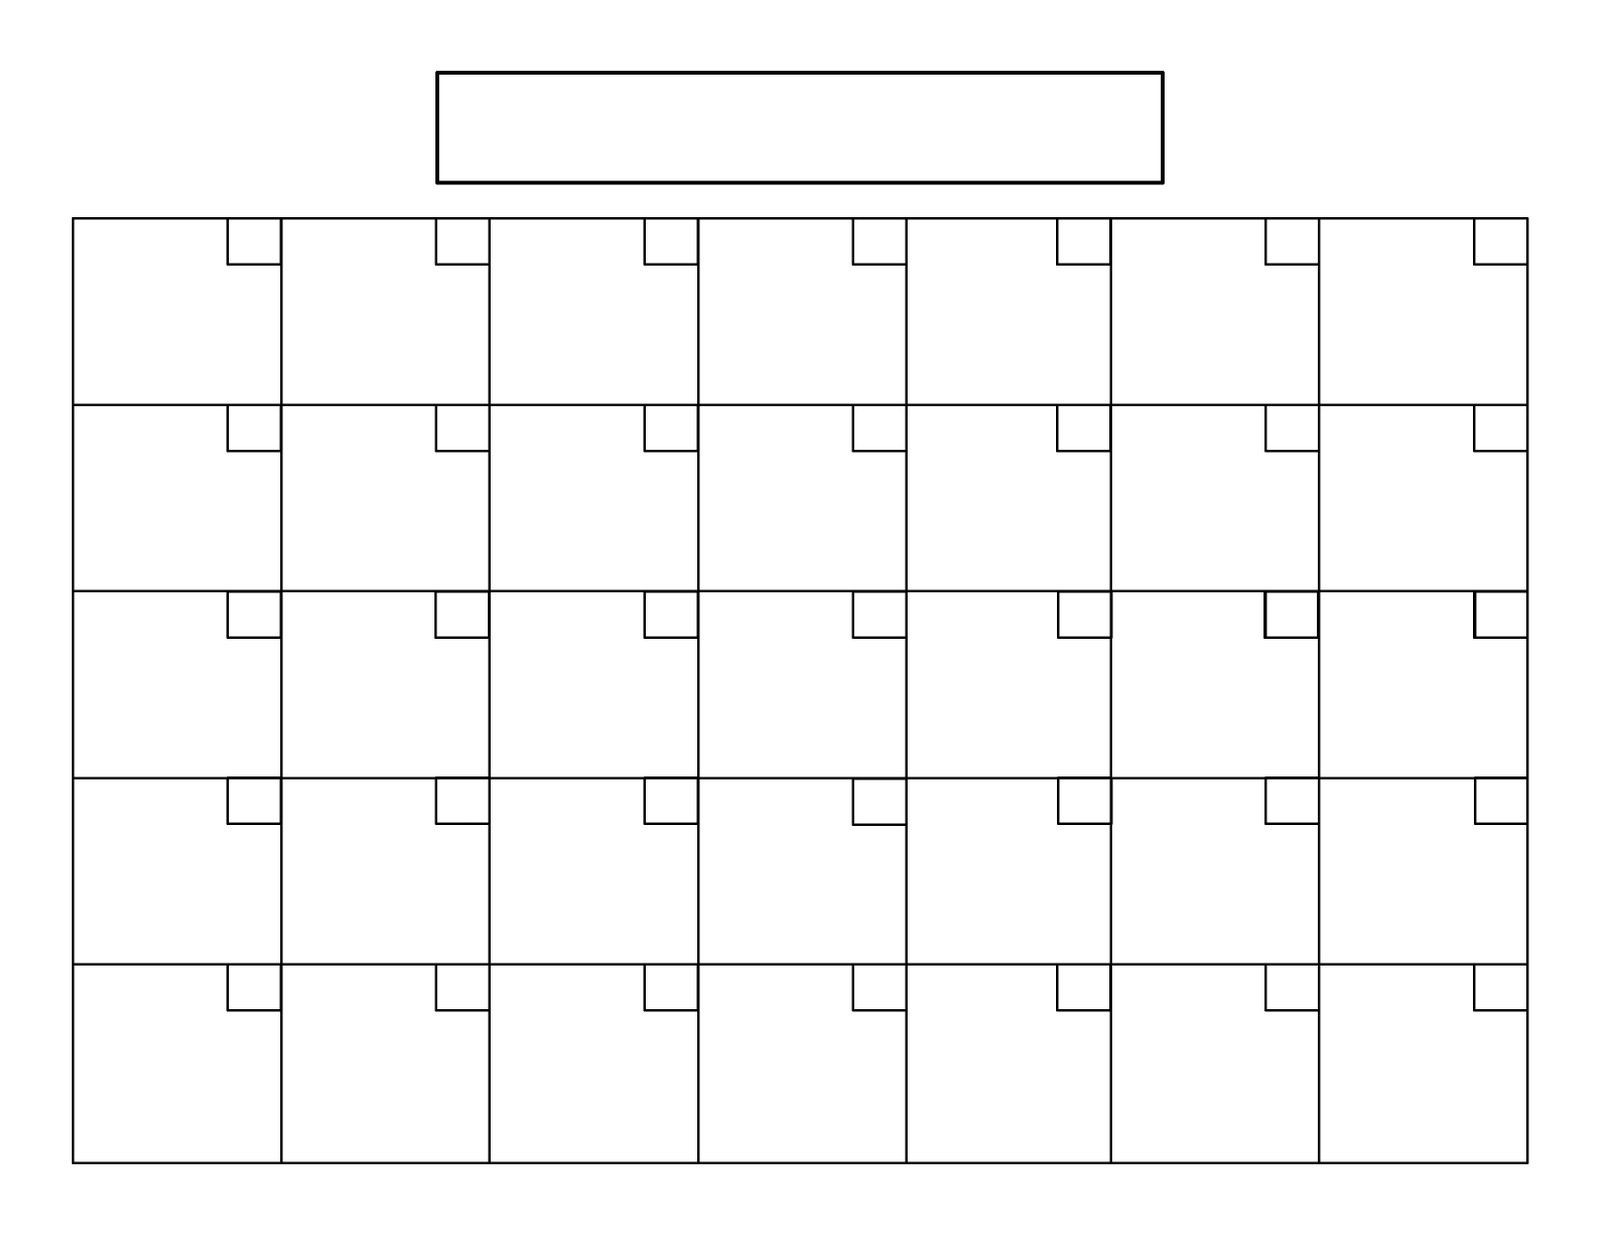 Exceptional 8.5X 11 Blank Calendar • Printable Blank-8.5 X 11 Blank Printable Calender